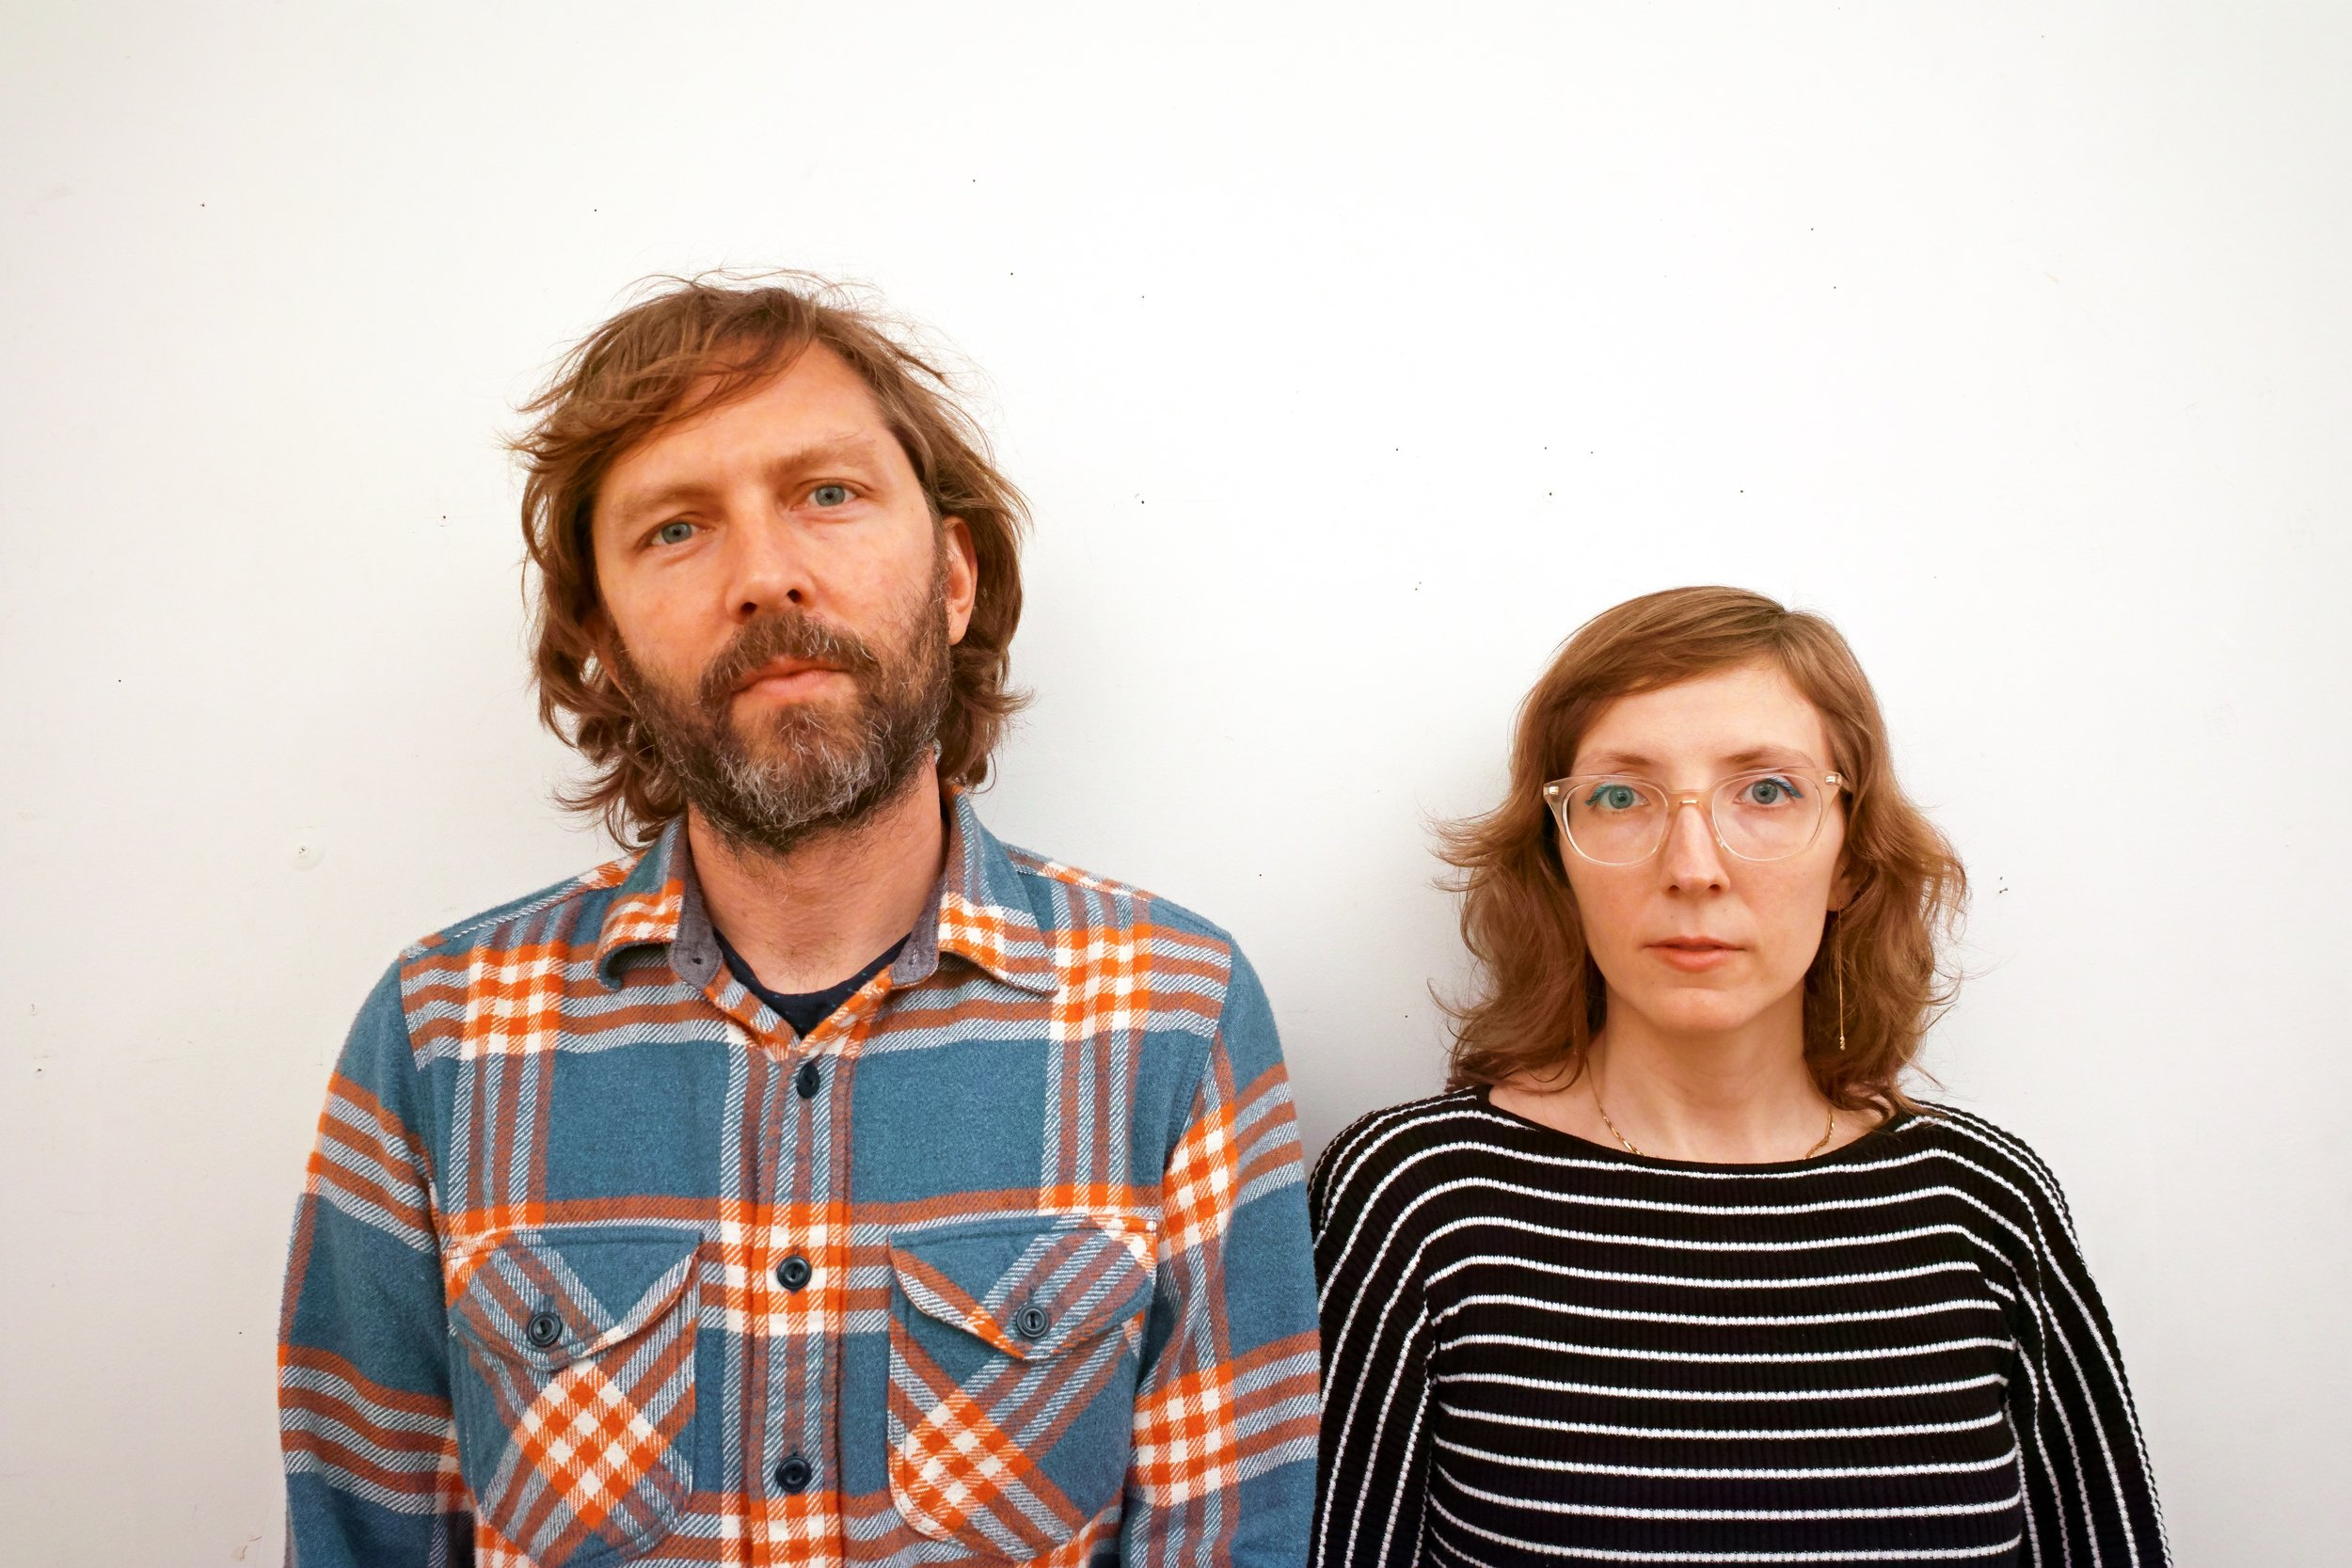 John Dieterich and Mary Halvorson photo by Satoru Eguchi